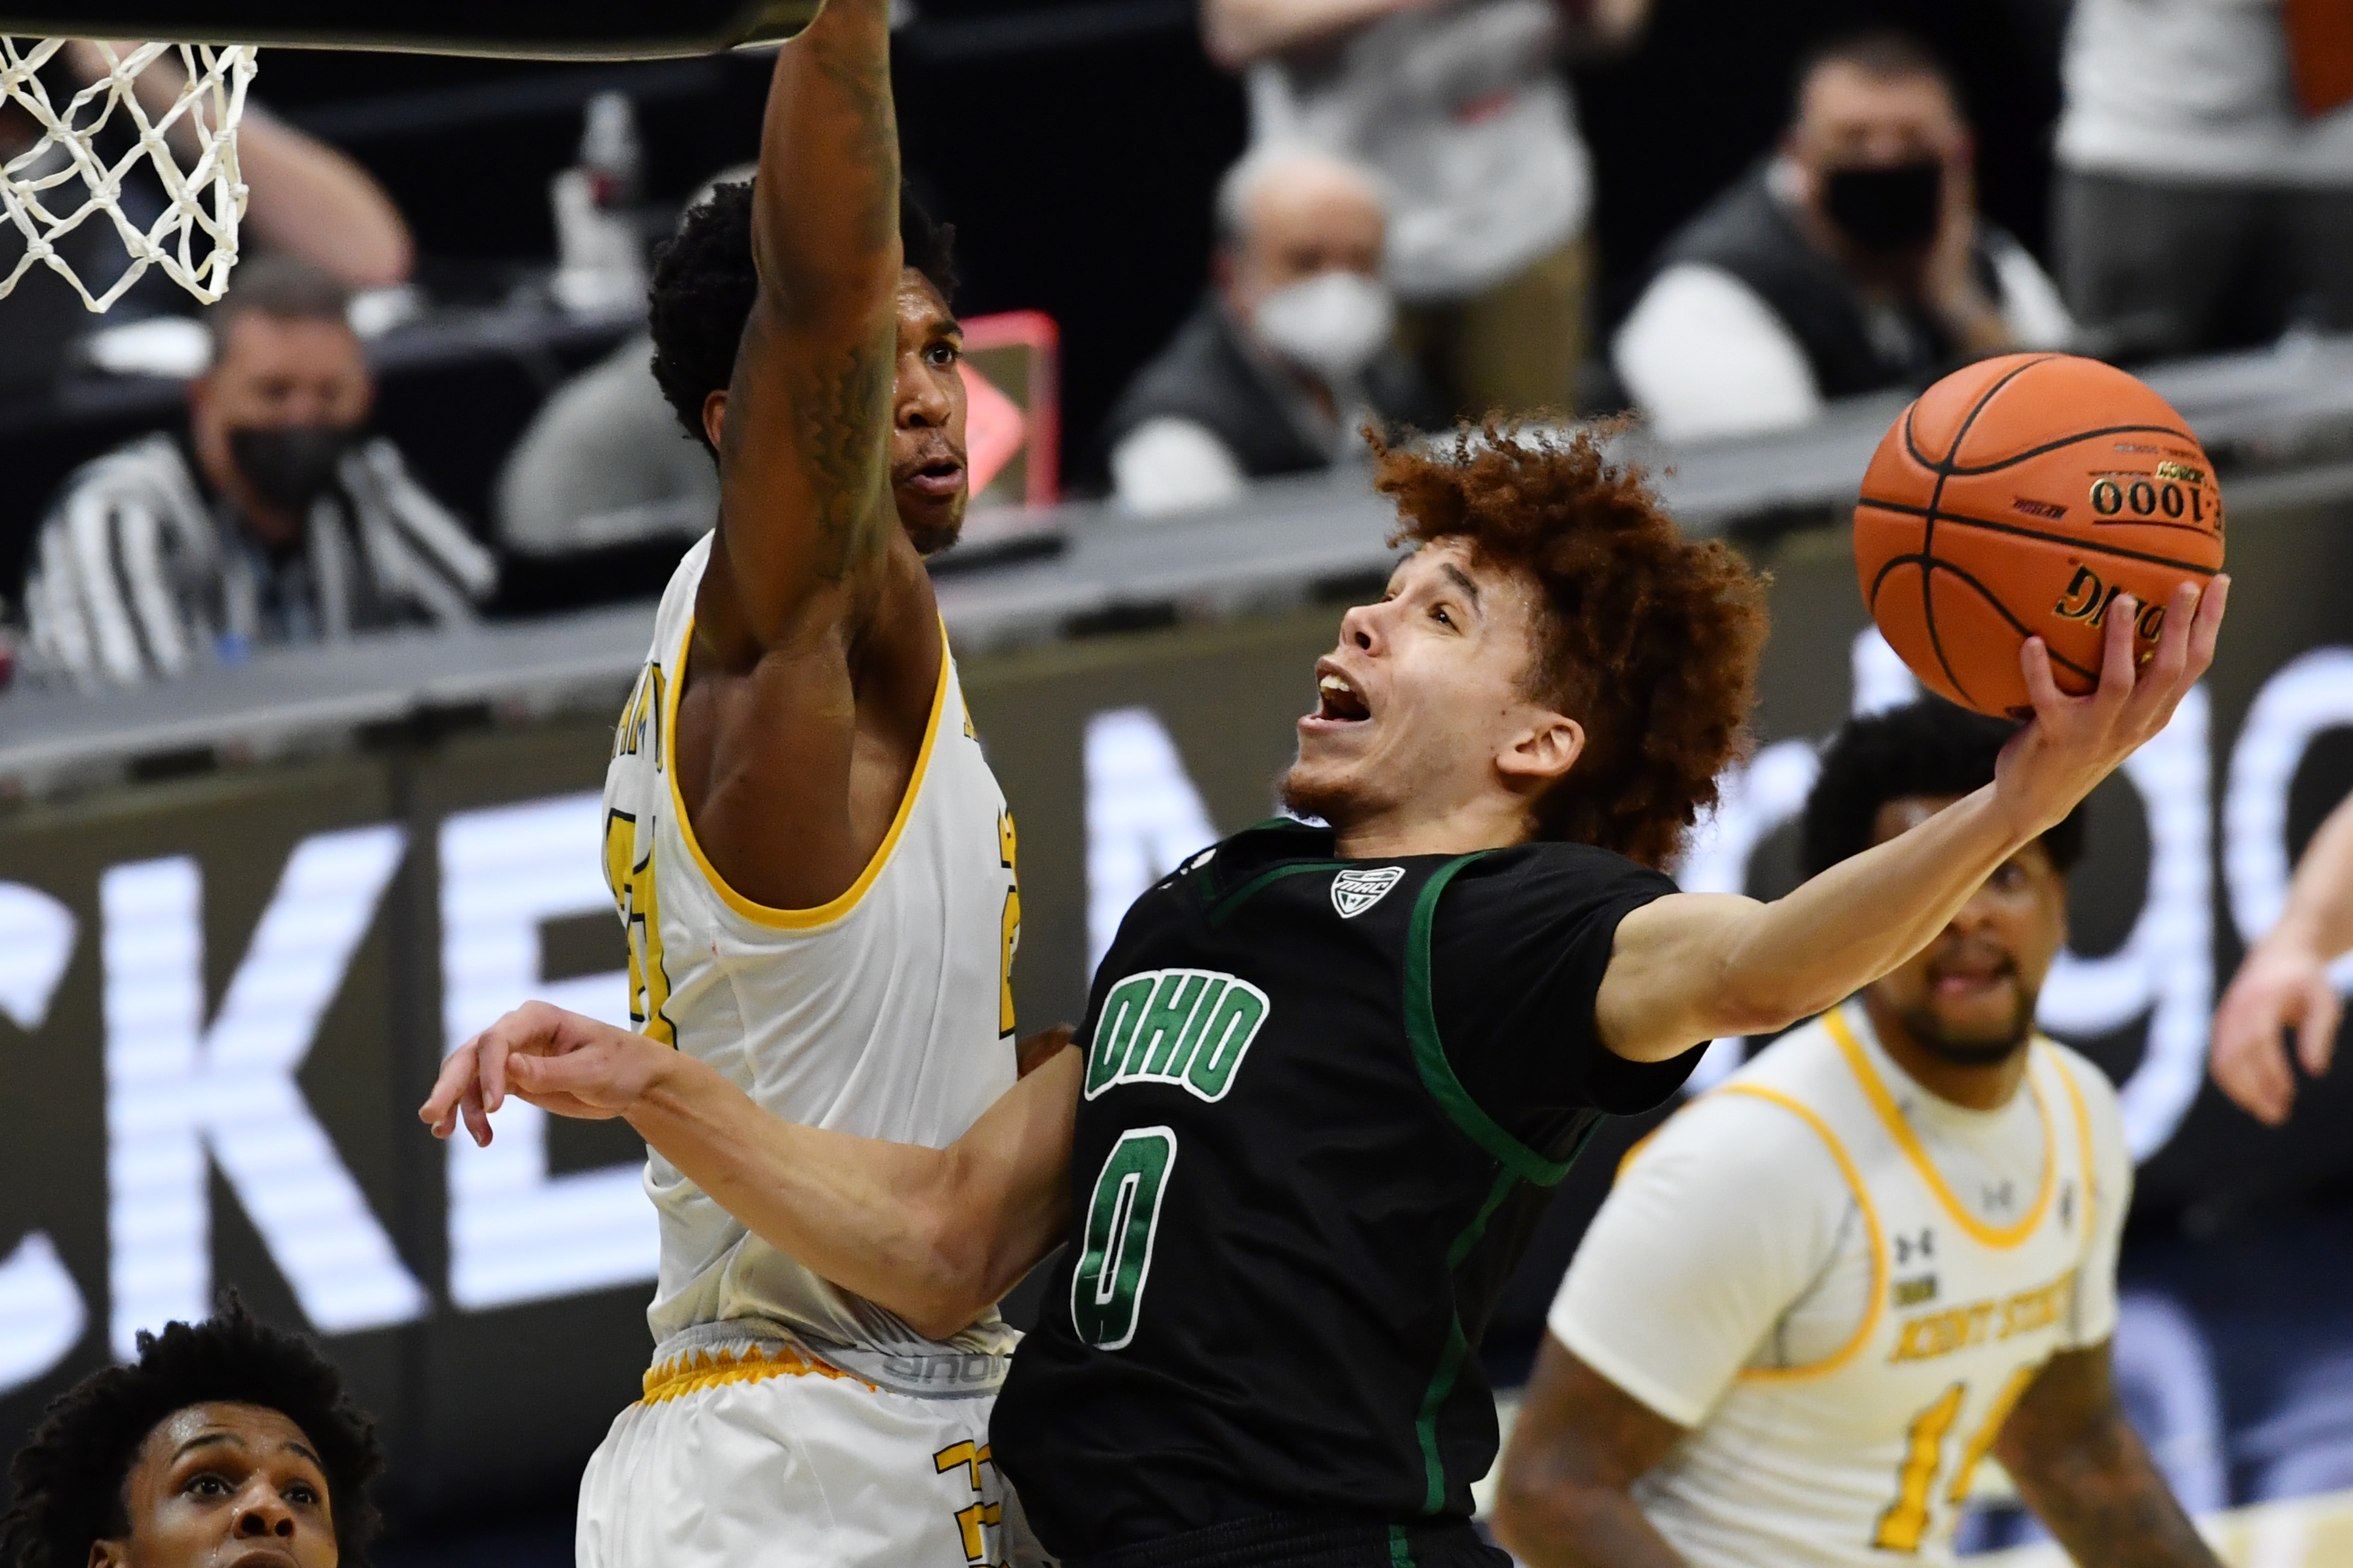 NCAA Basketball: MAC Conference Tournament - Kent State vs Ohio